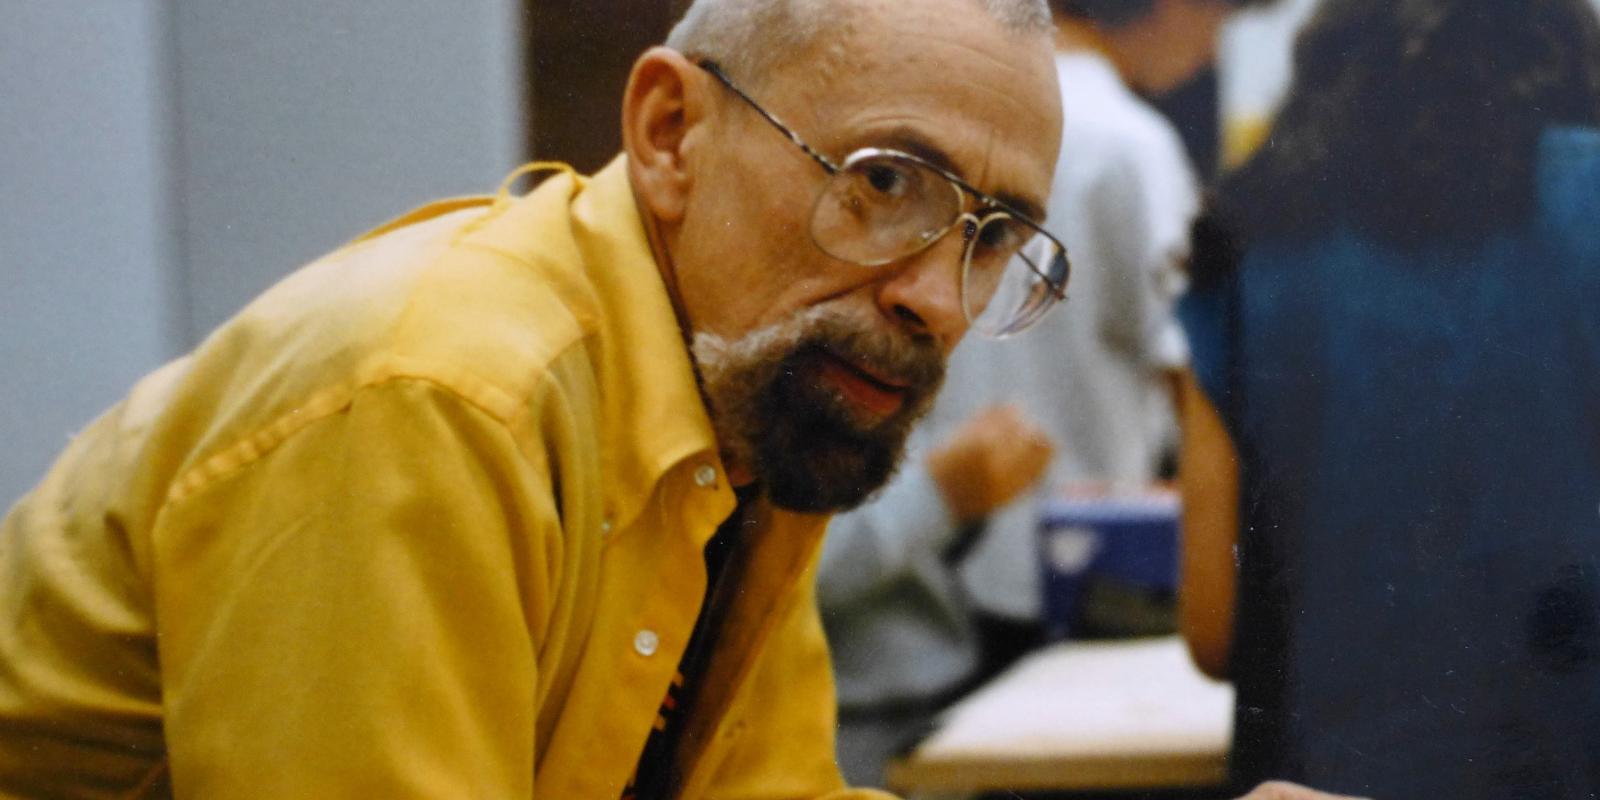 Professor Emeritus Paul Helmle (Image courtesy of Nicholas Pyle)